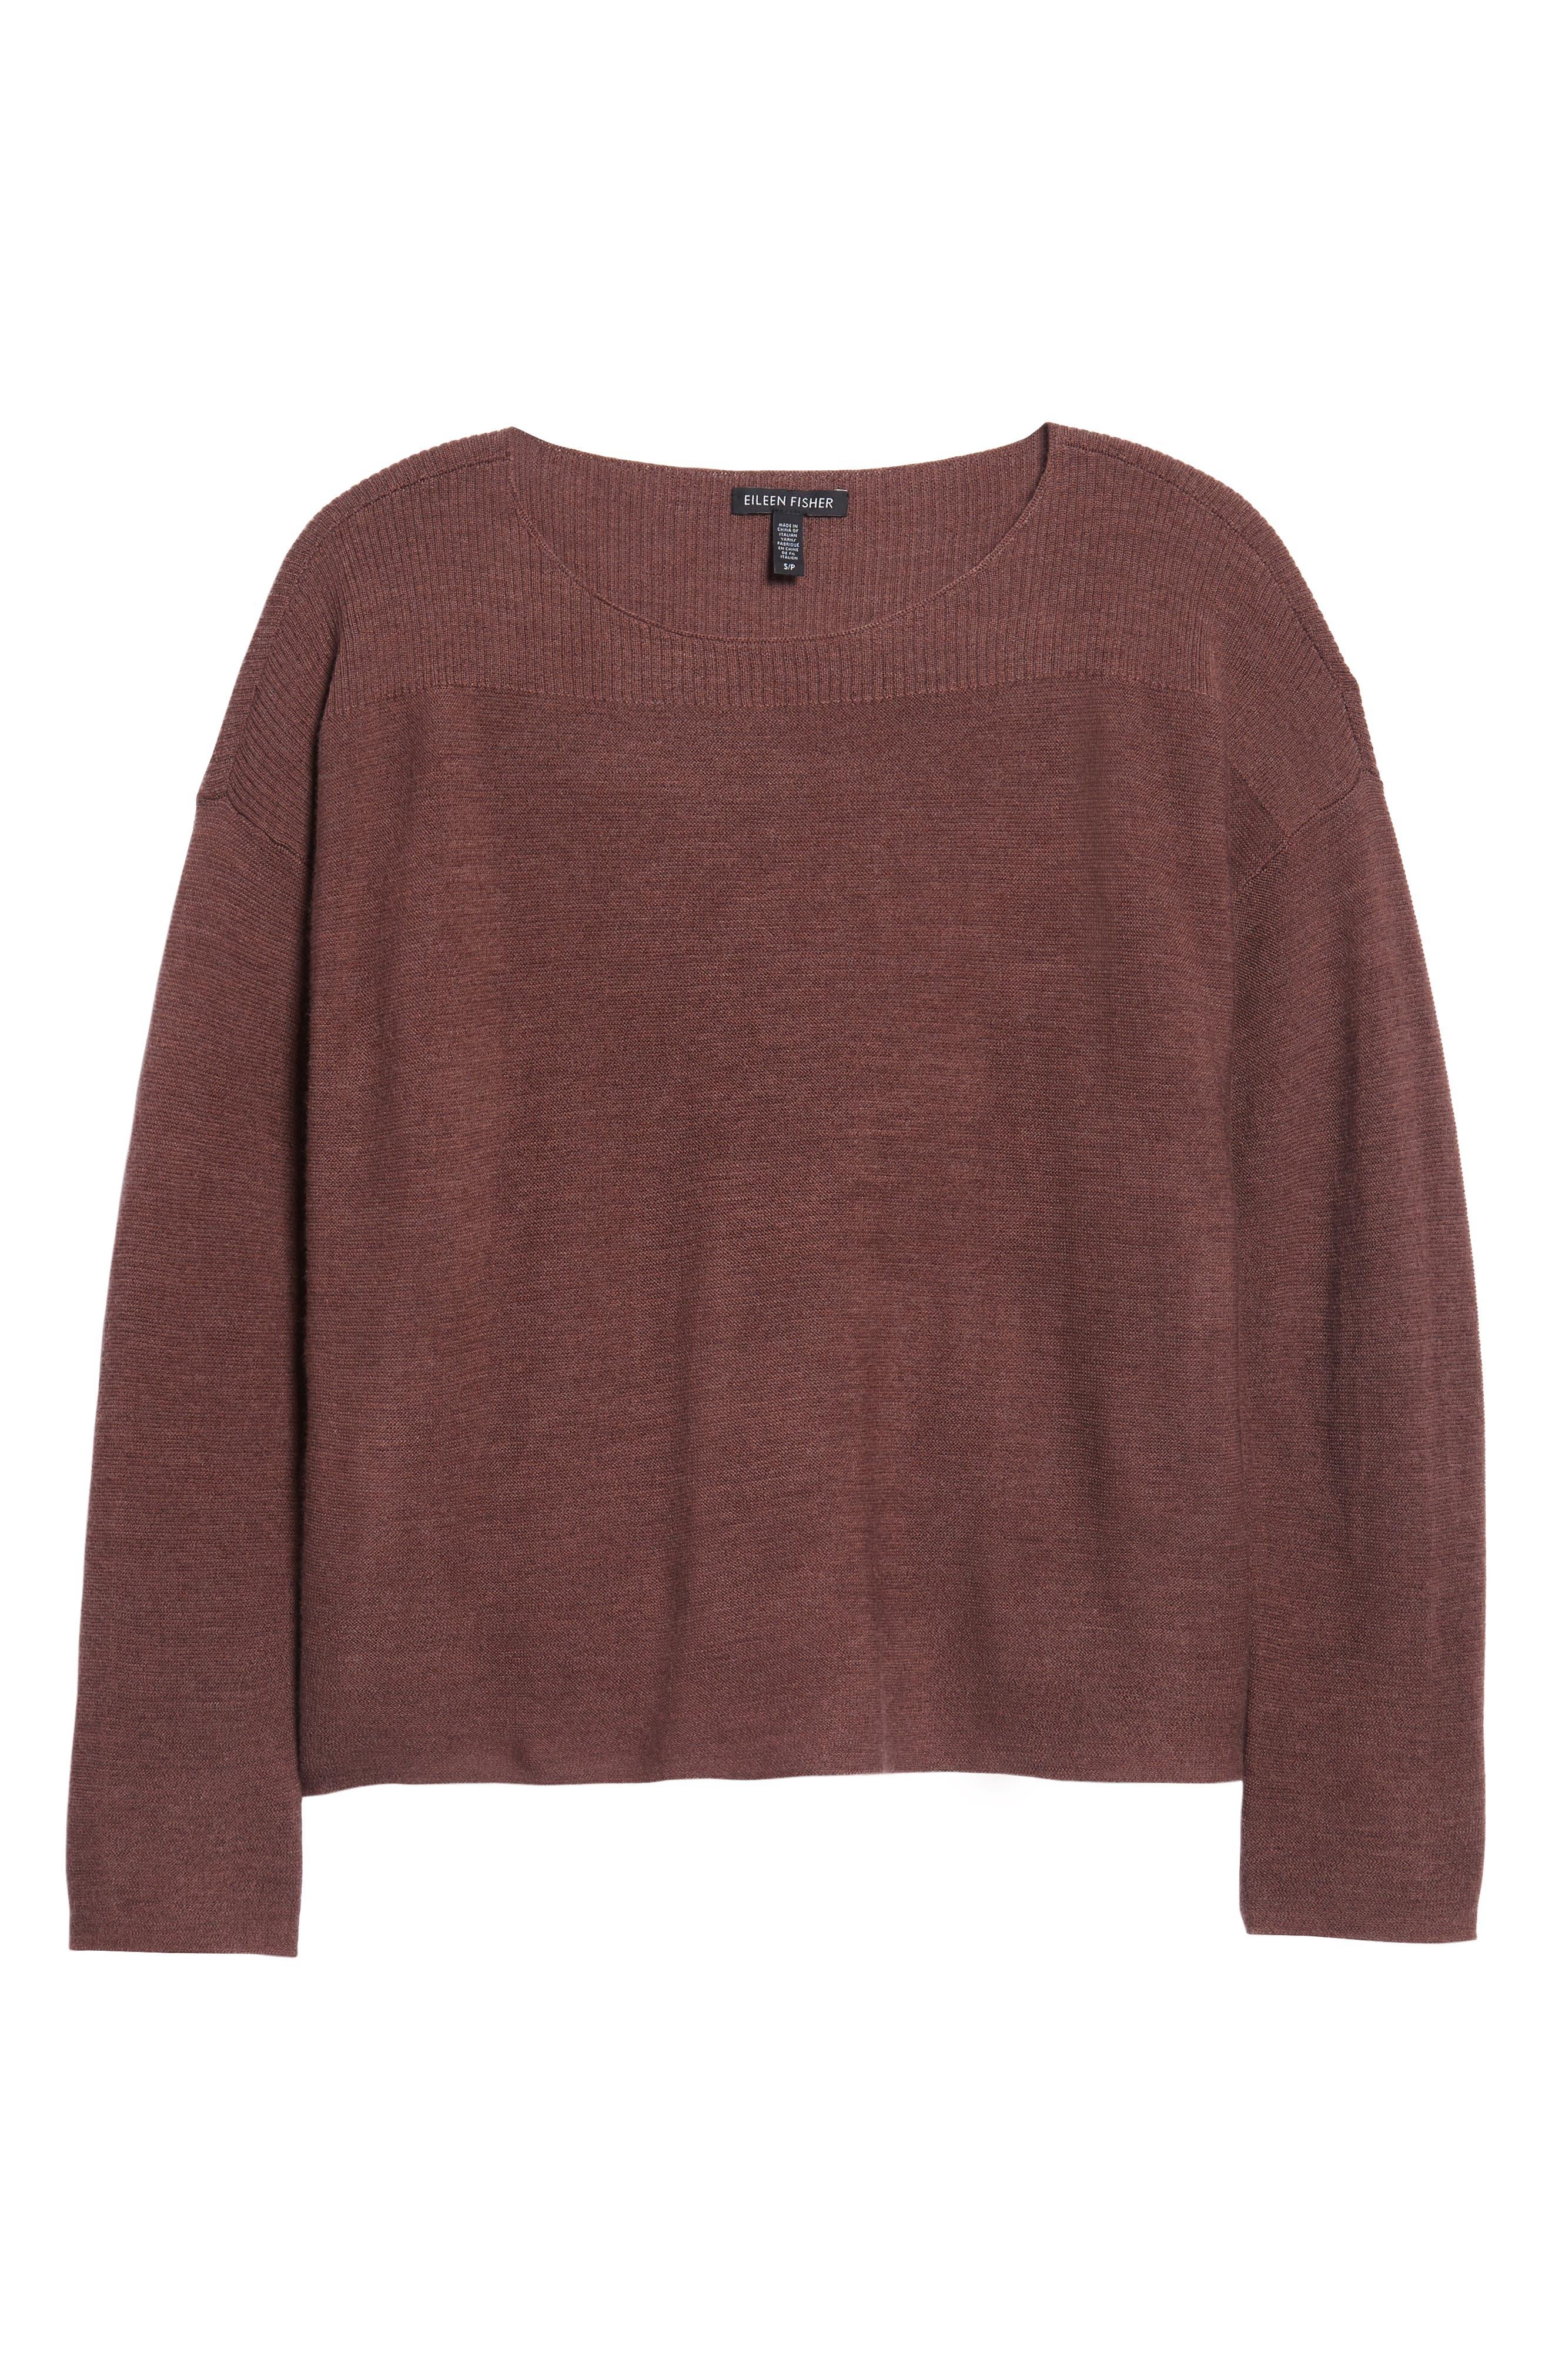 Mix Stitch Merino Bateau Neck Sweater,                             Main thumbnail 1, color,                             Mahogany